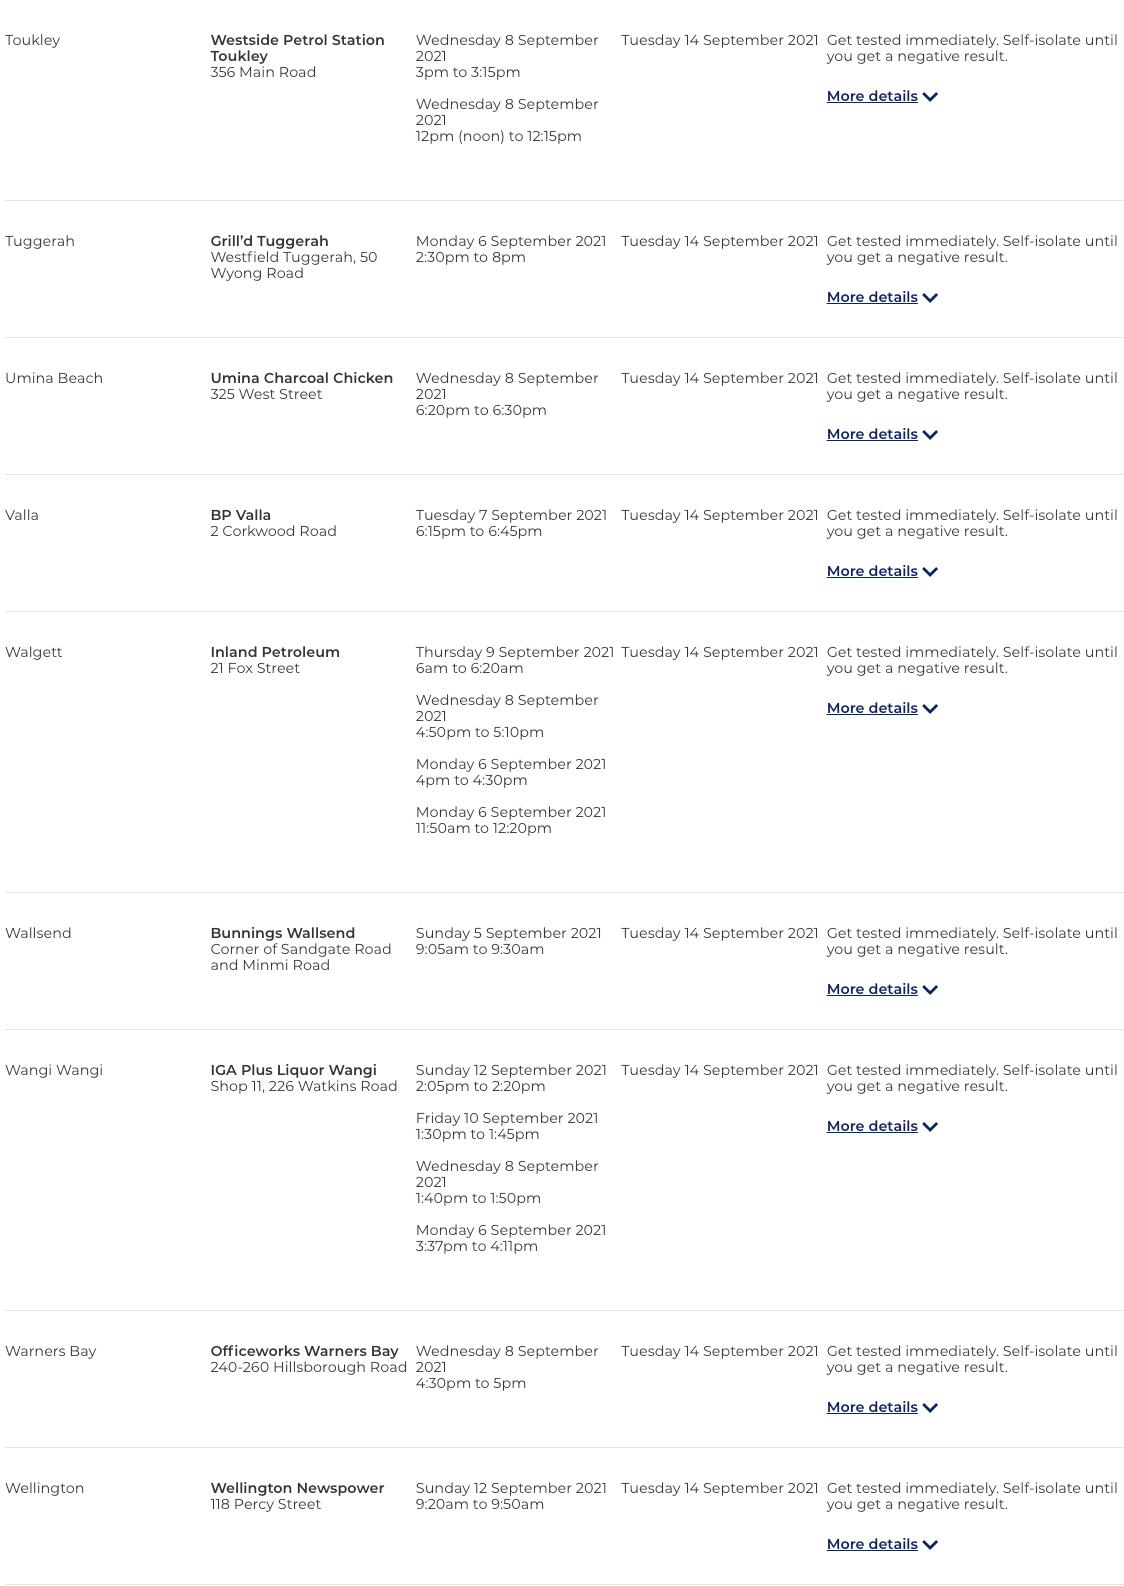 www.nsw.gov.au_covid-19_nsw-covid-19-case-locations_case-locations (33).png